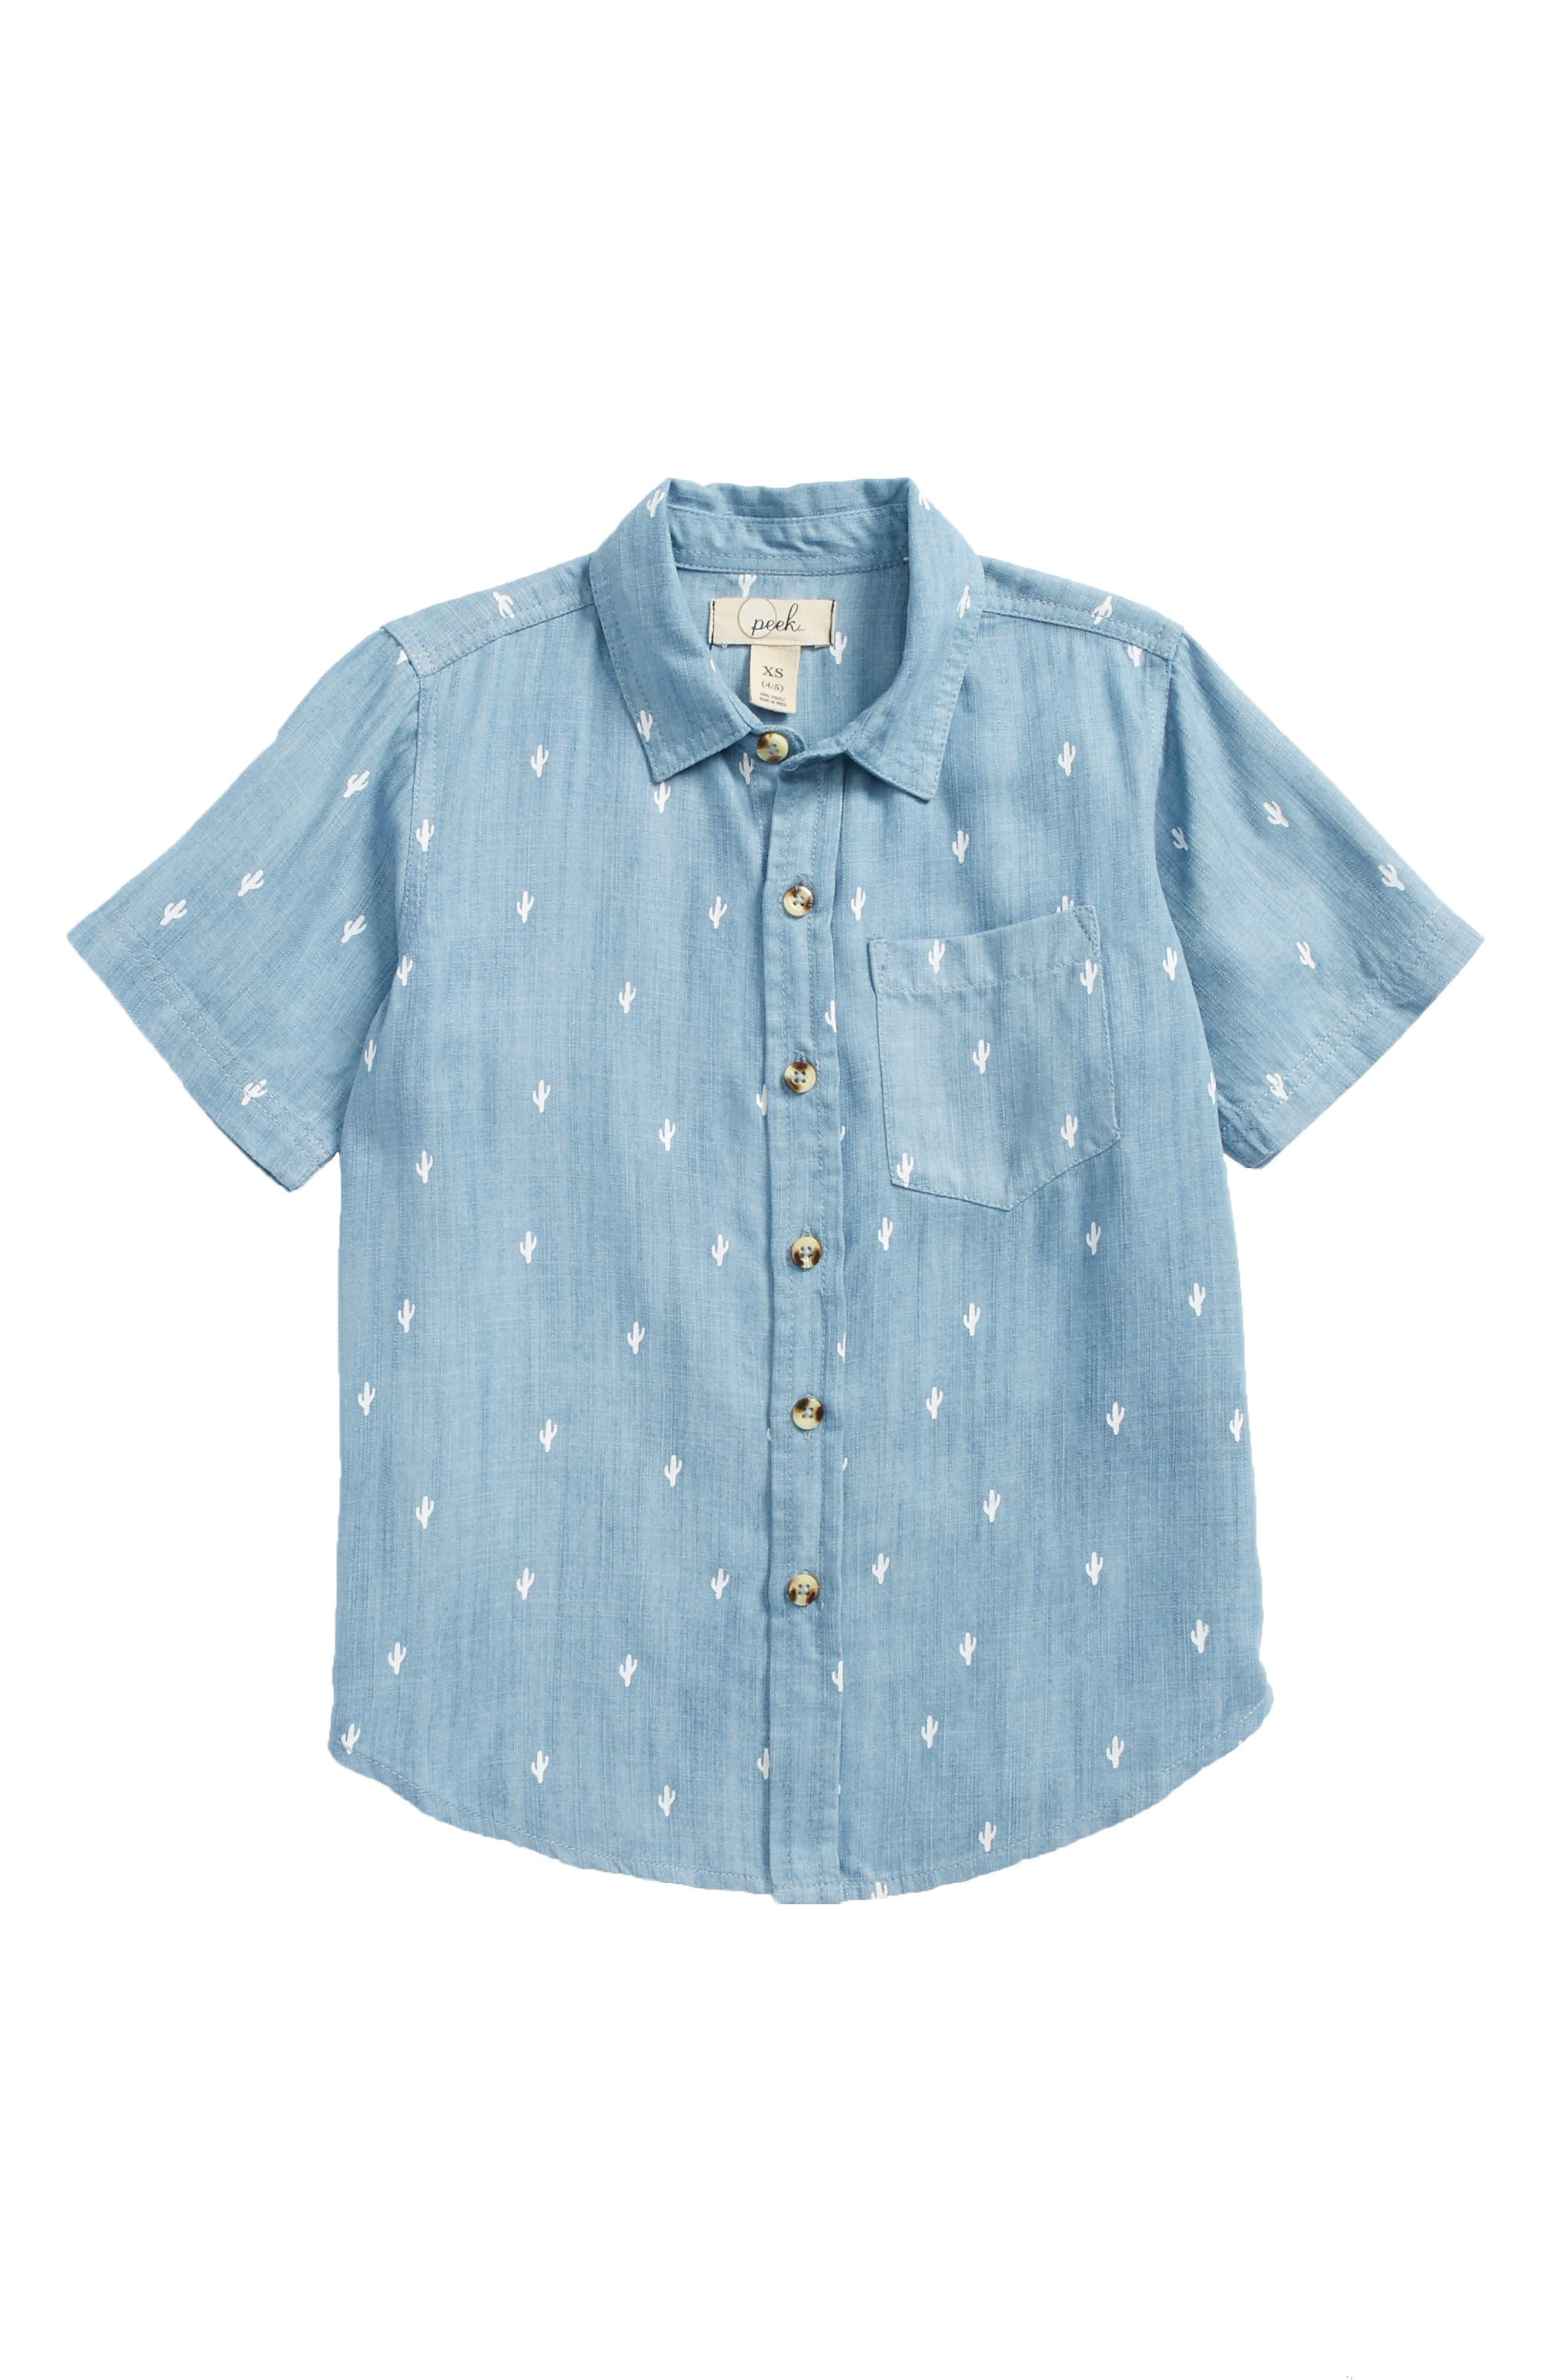 Cactus Woven Shirt,                         Main,                         color, 402